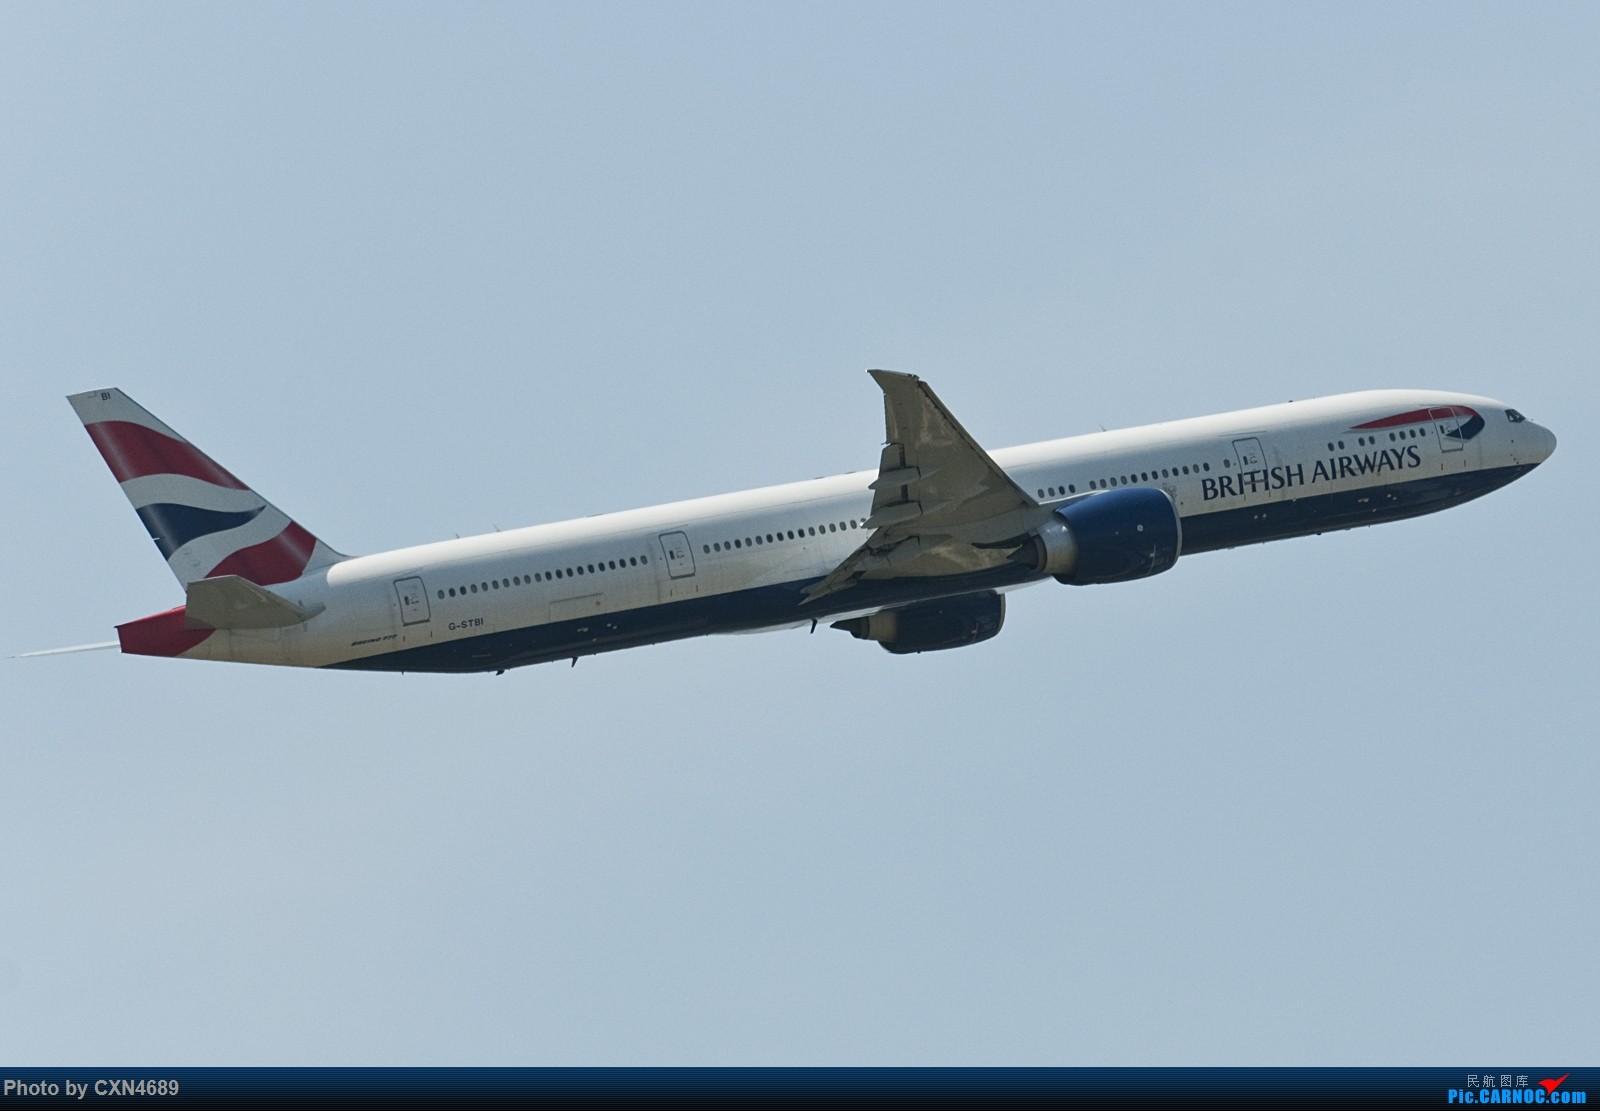 Re:[原创]PVG好天气之N250试镜:A388德胖~(附送几张杂图) BOEING 777-300ER G-STBI 中国上海浦东国际机场